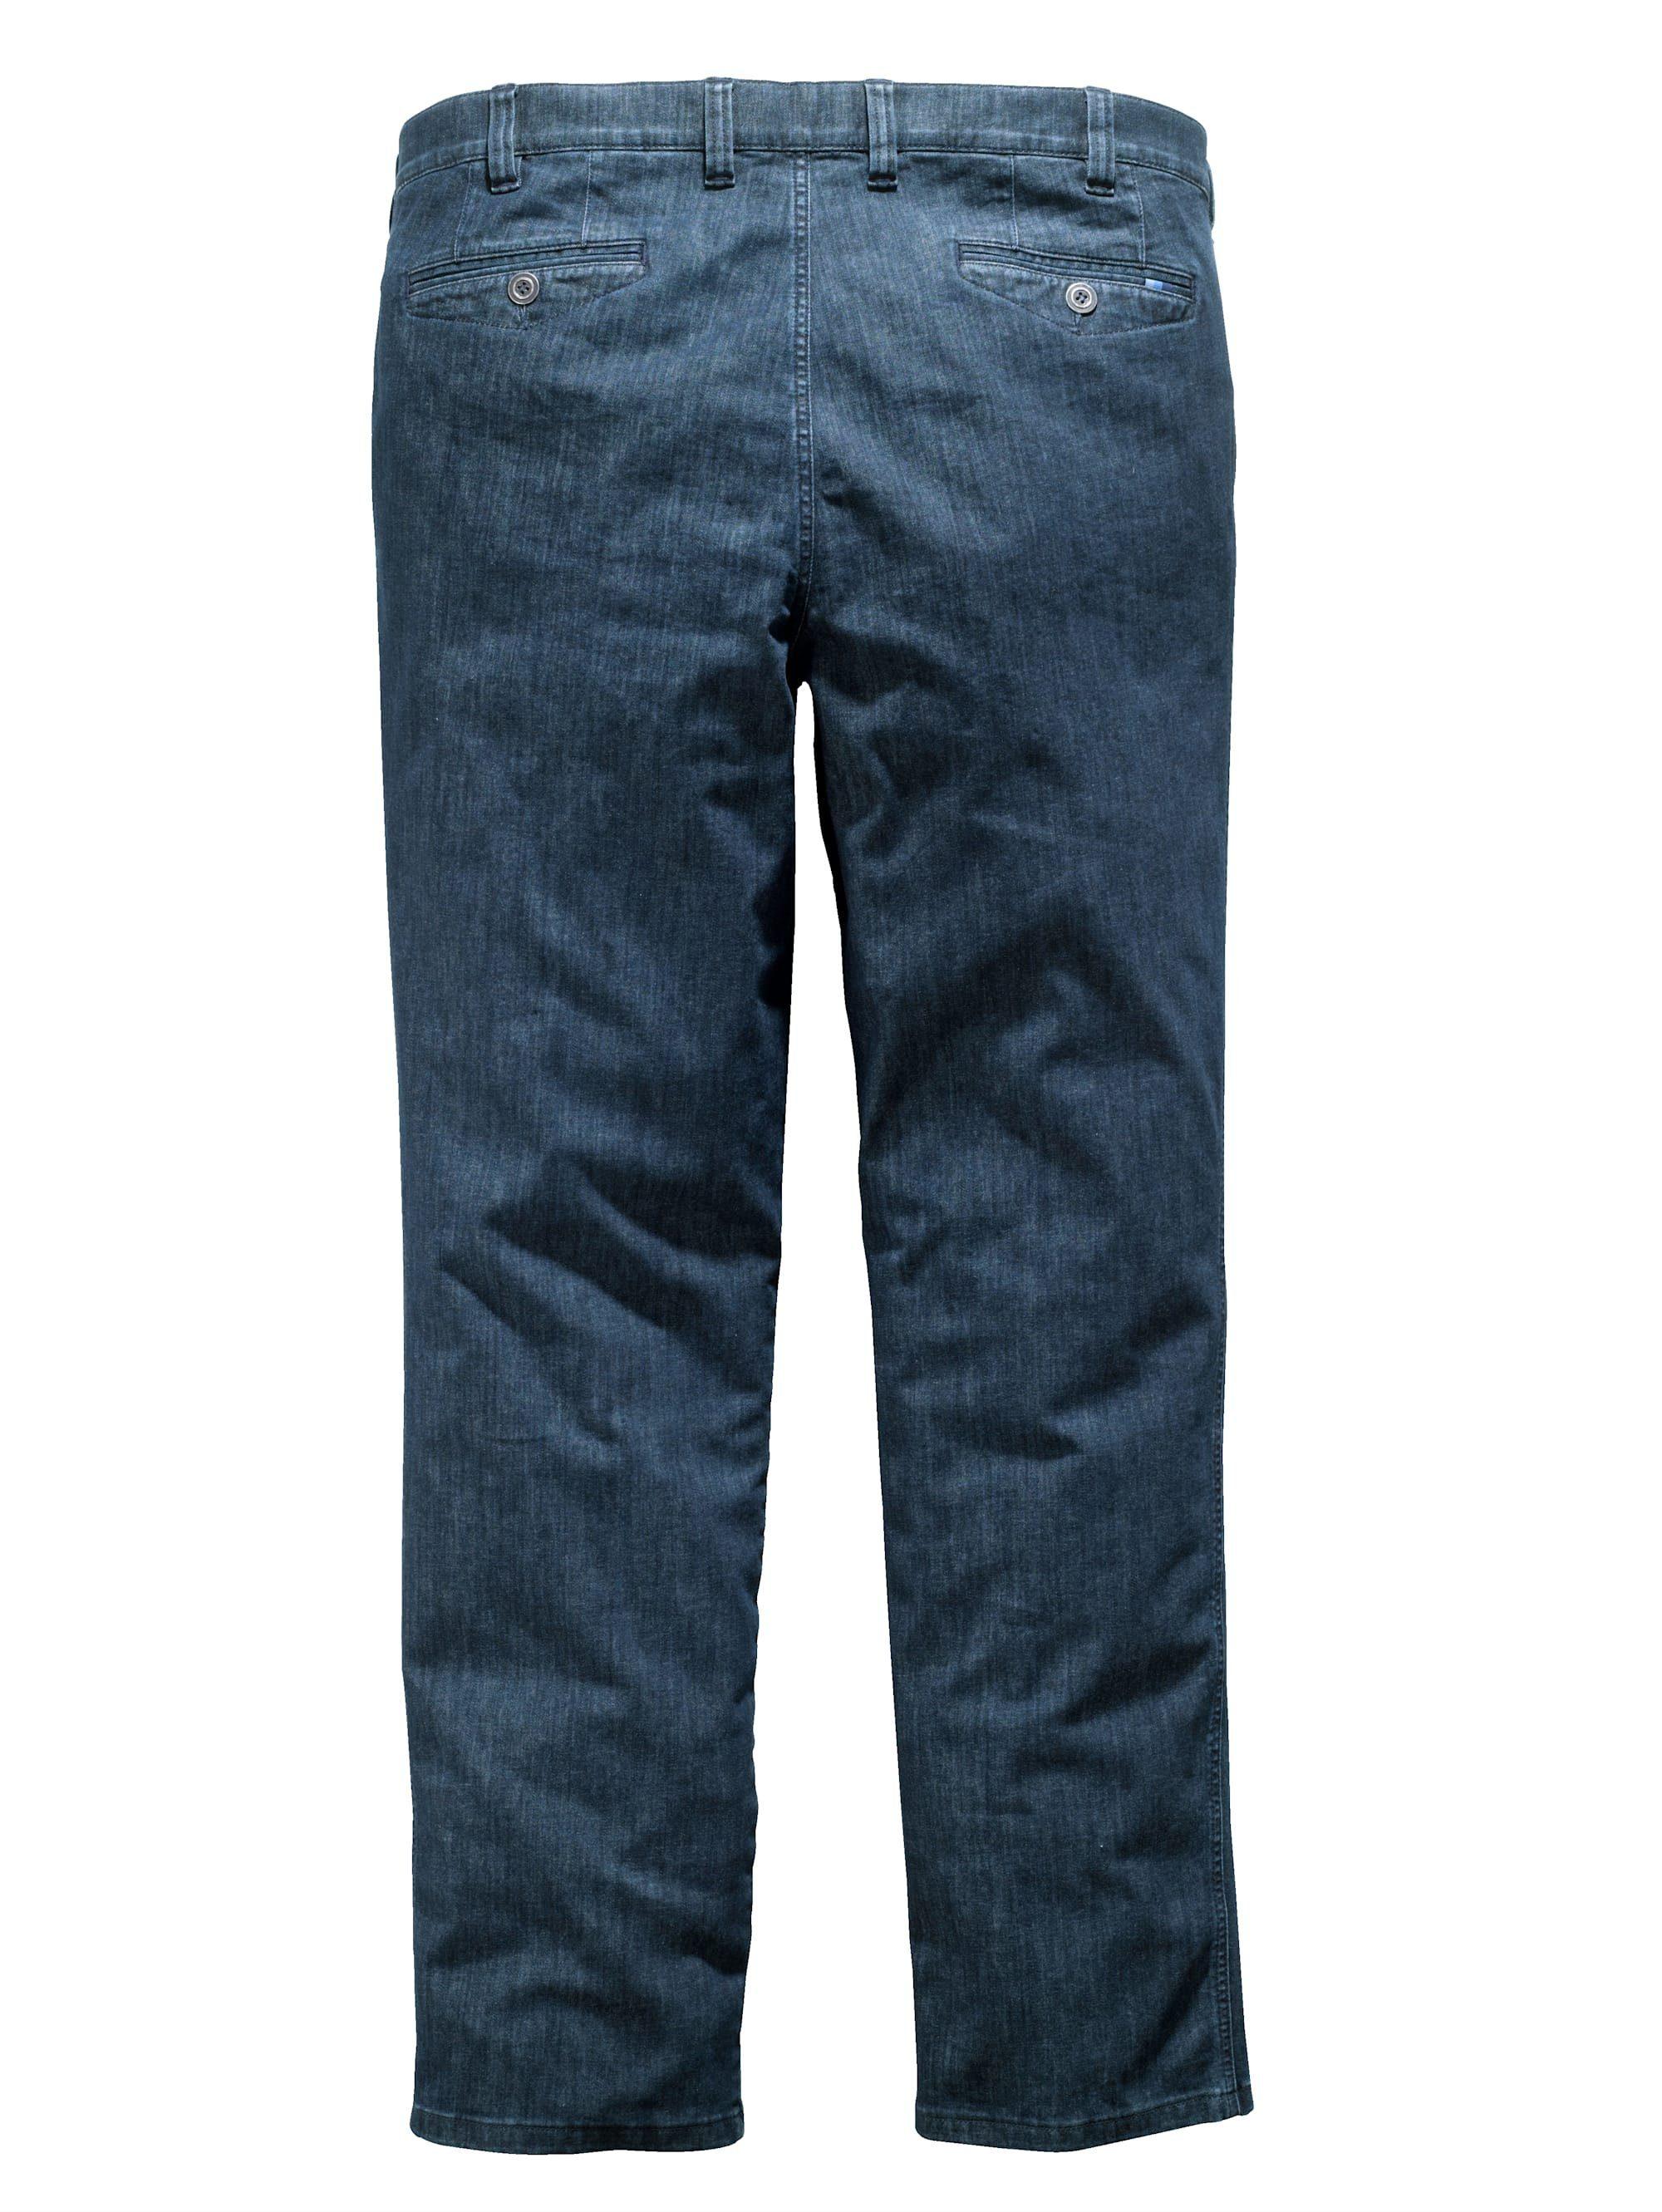 Men Plus by Happy Size Jeans in Stretch-Qualität kLZTGV